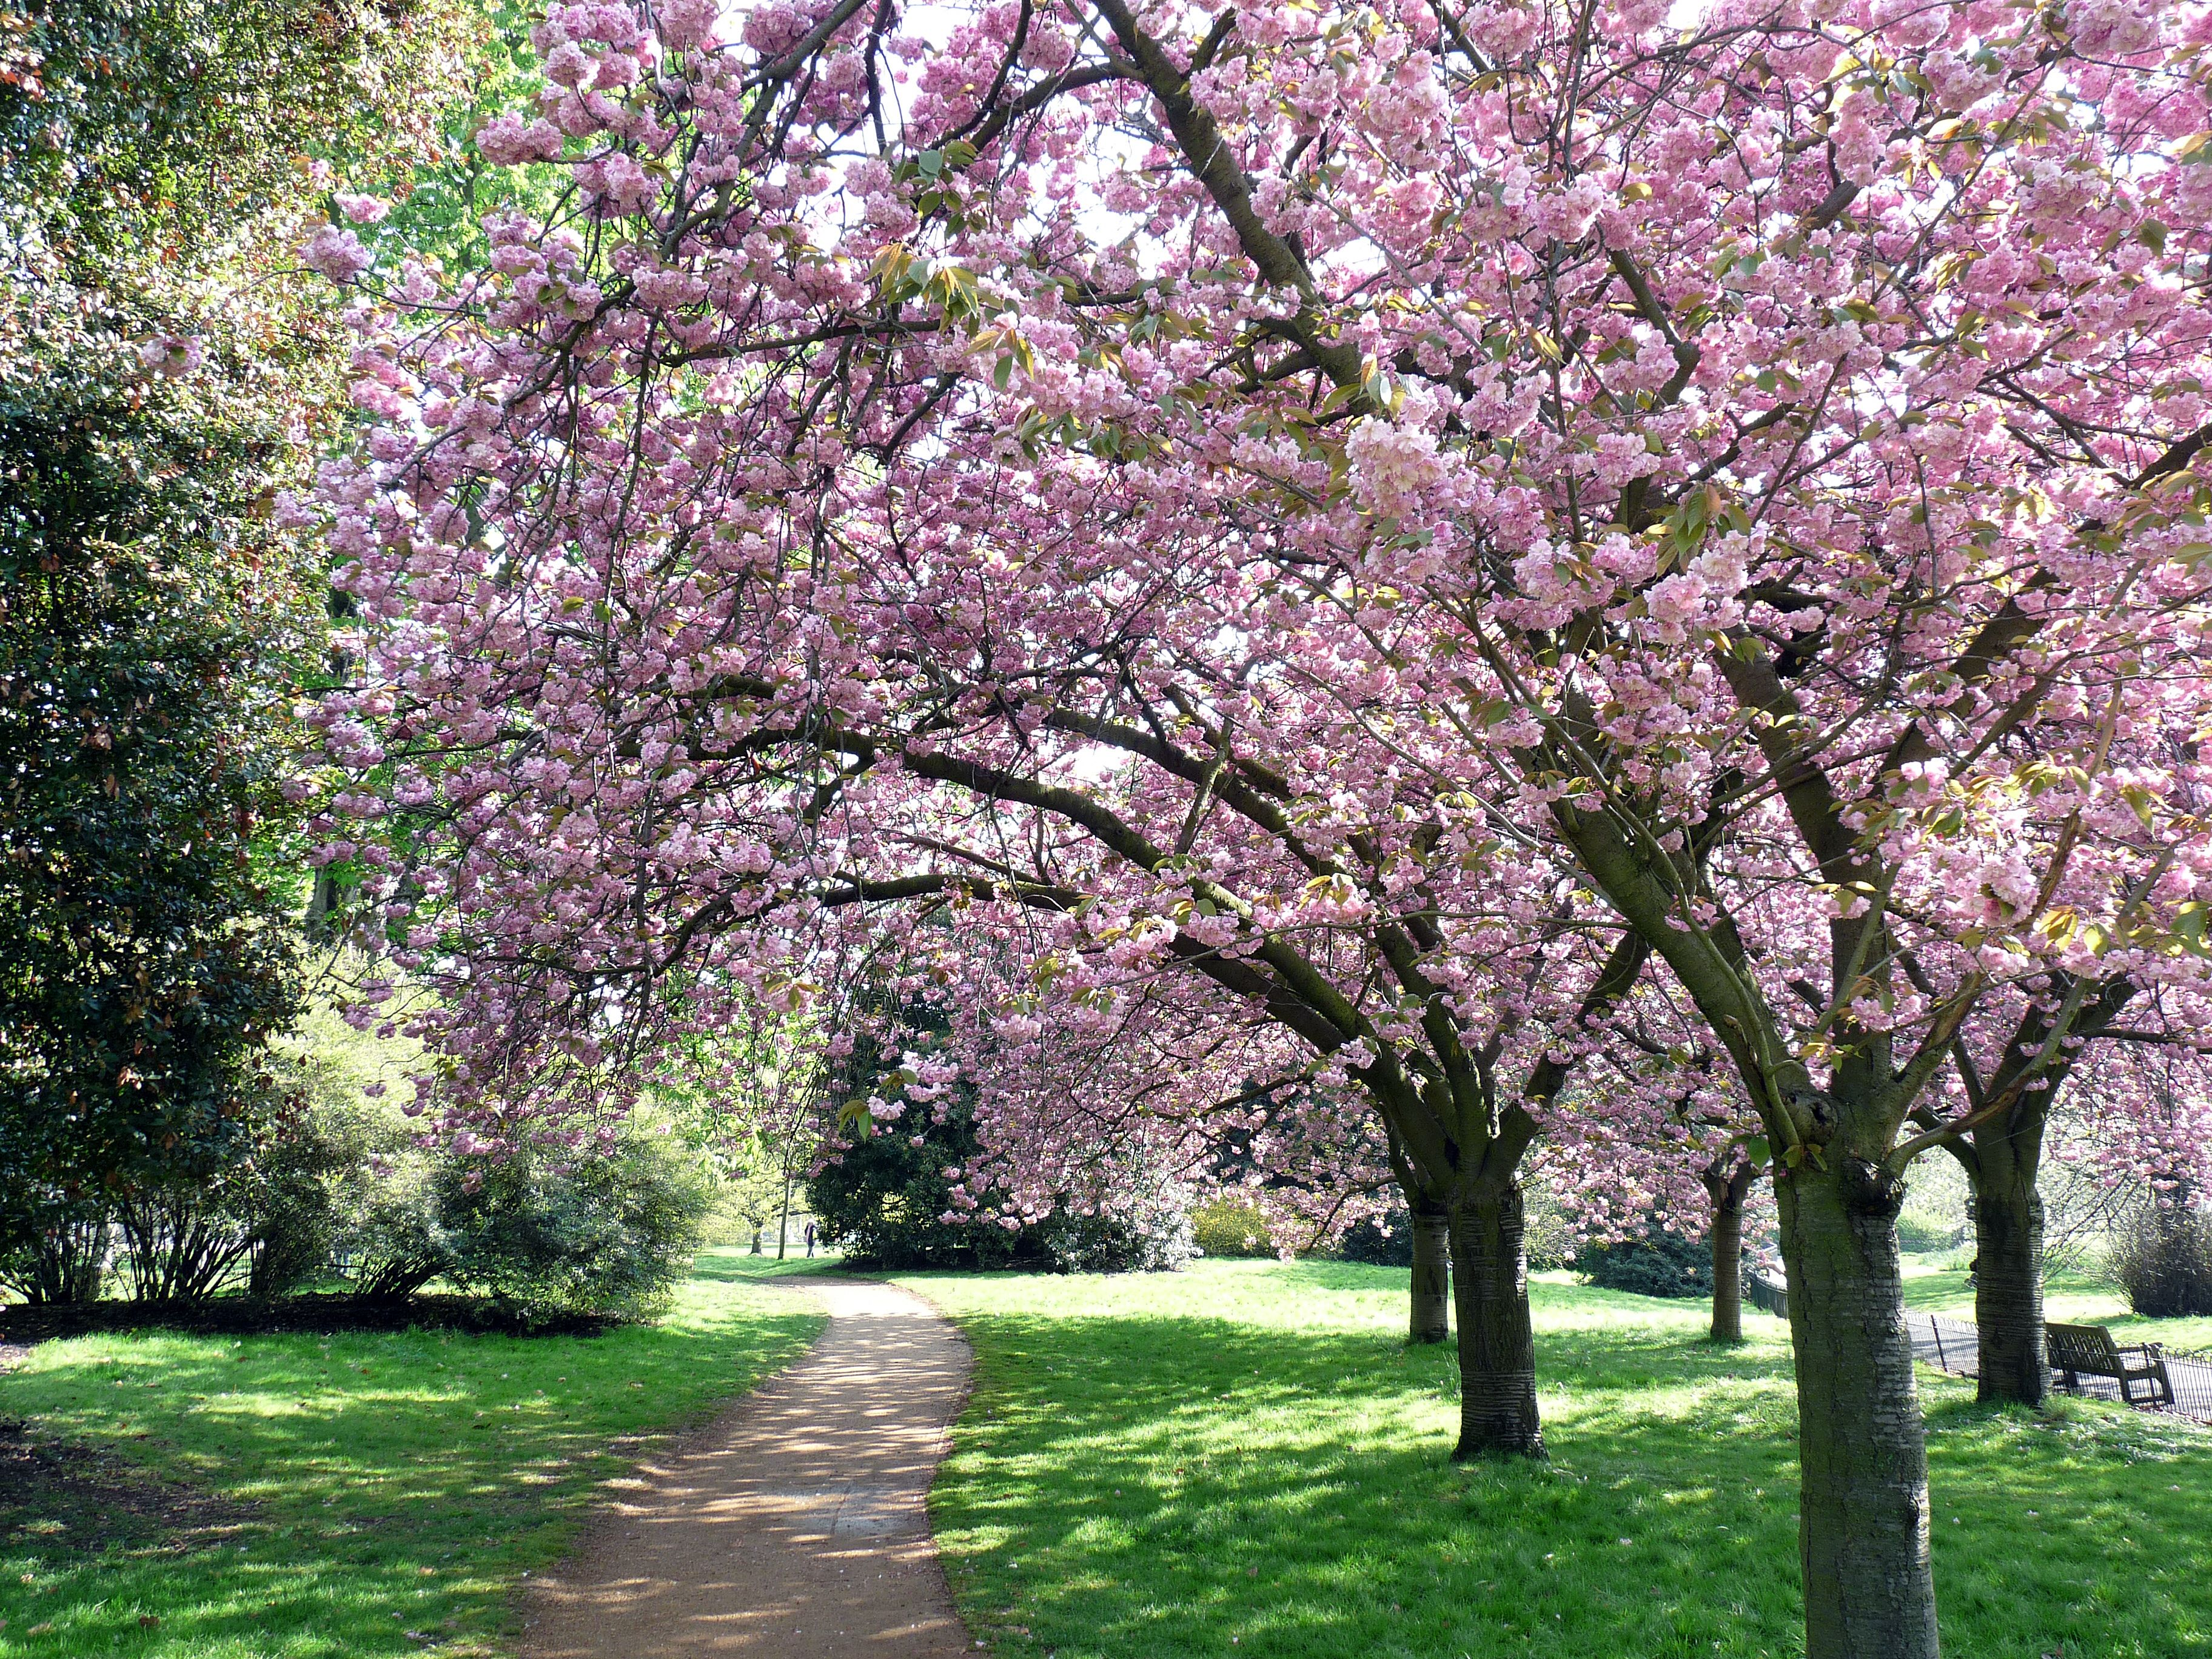 Cherry Blossom Cherry Blossom Images Cherry Blossom Dream Garden